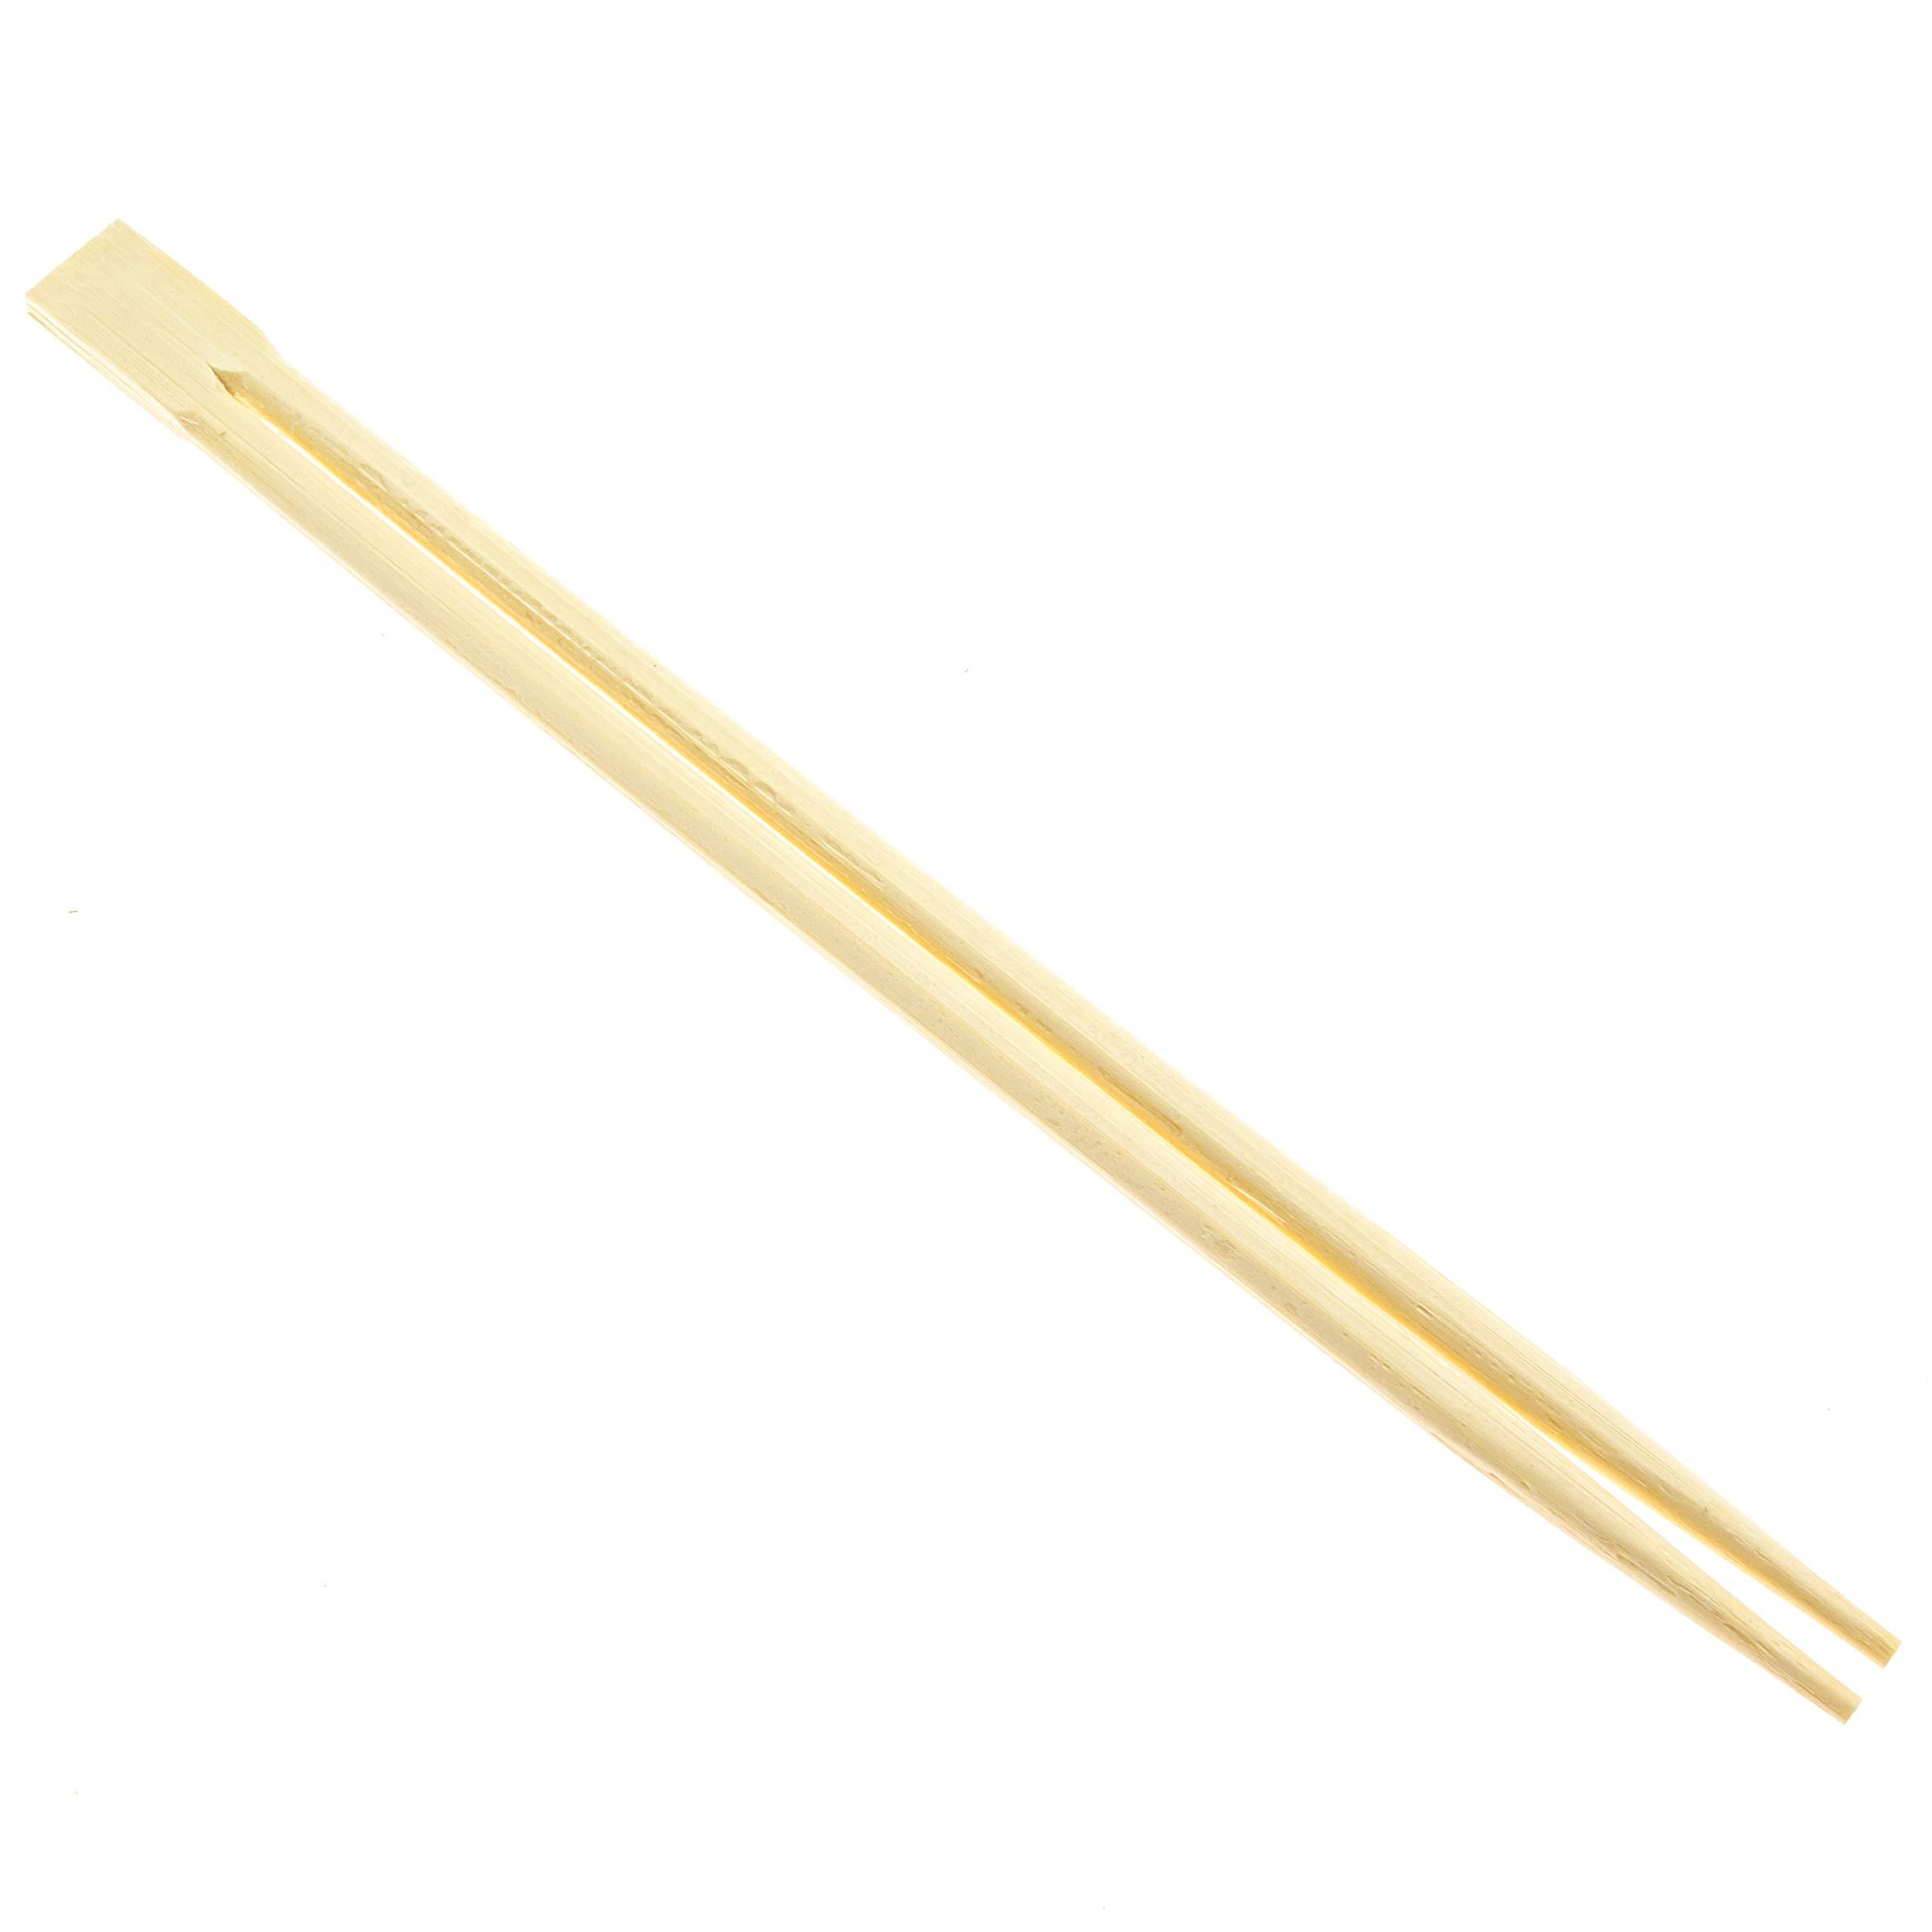 Premium Disposable Bamboo Chopsticks (500 sets), Japanese Disposable Chopsticks Bulk, 9'', Certified Quality by Soeos (Image #3)